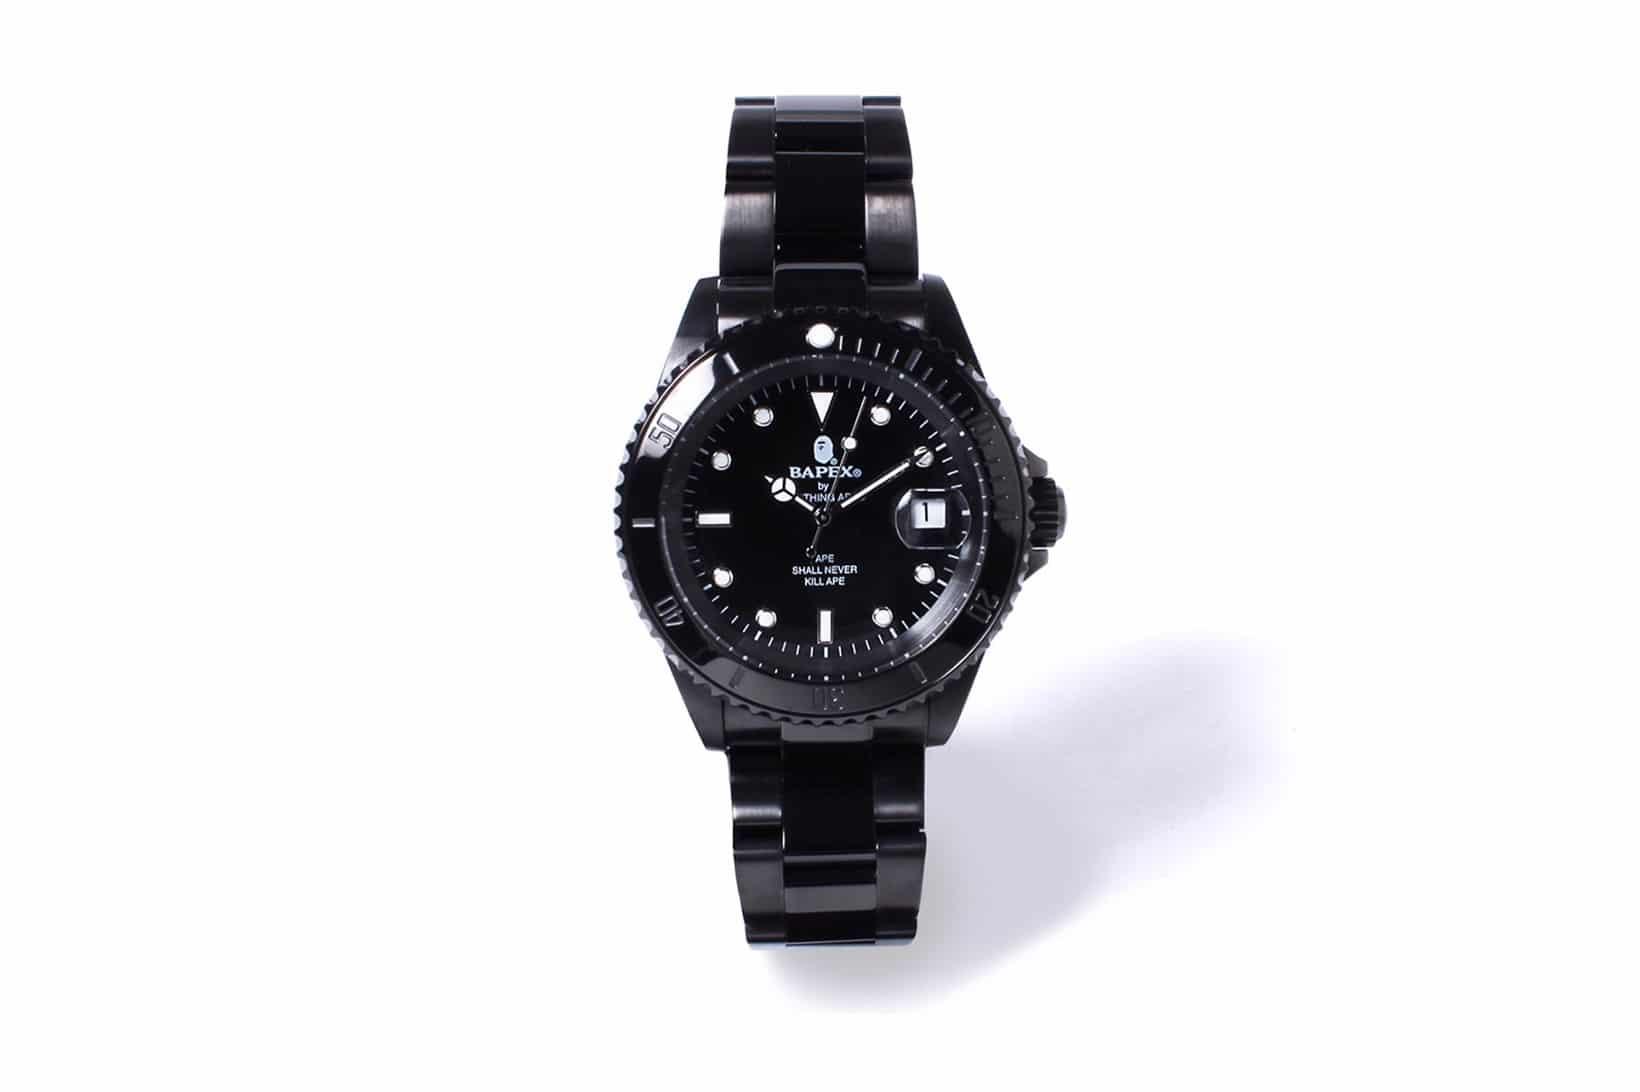 BAPE horloges BAPEX TYPE-1